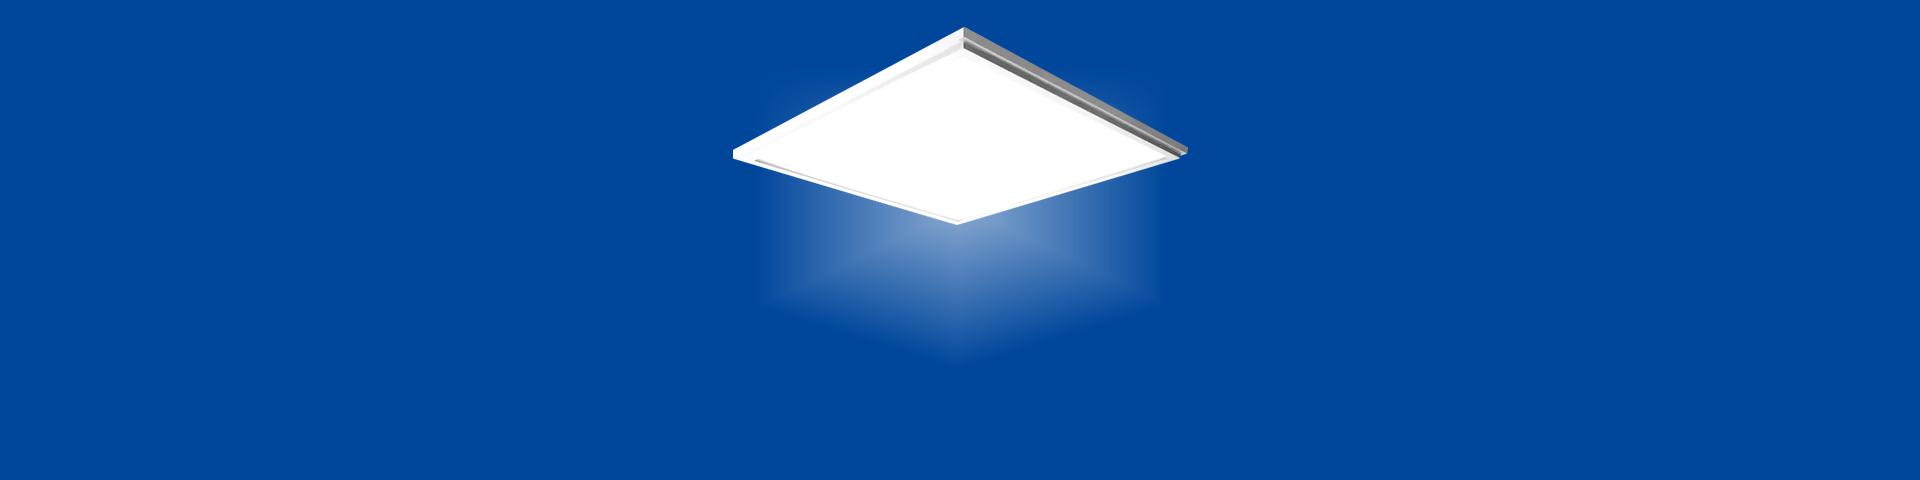 Замена светильника Армстронг<br /> на LED-Панель — <span>всего 200 Р.</span>